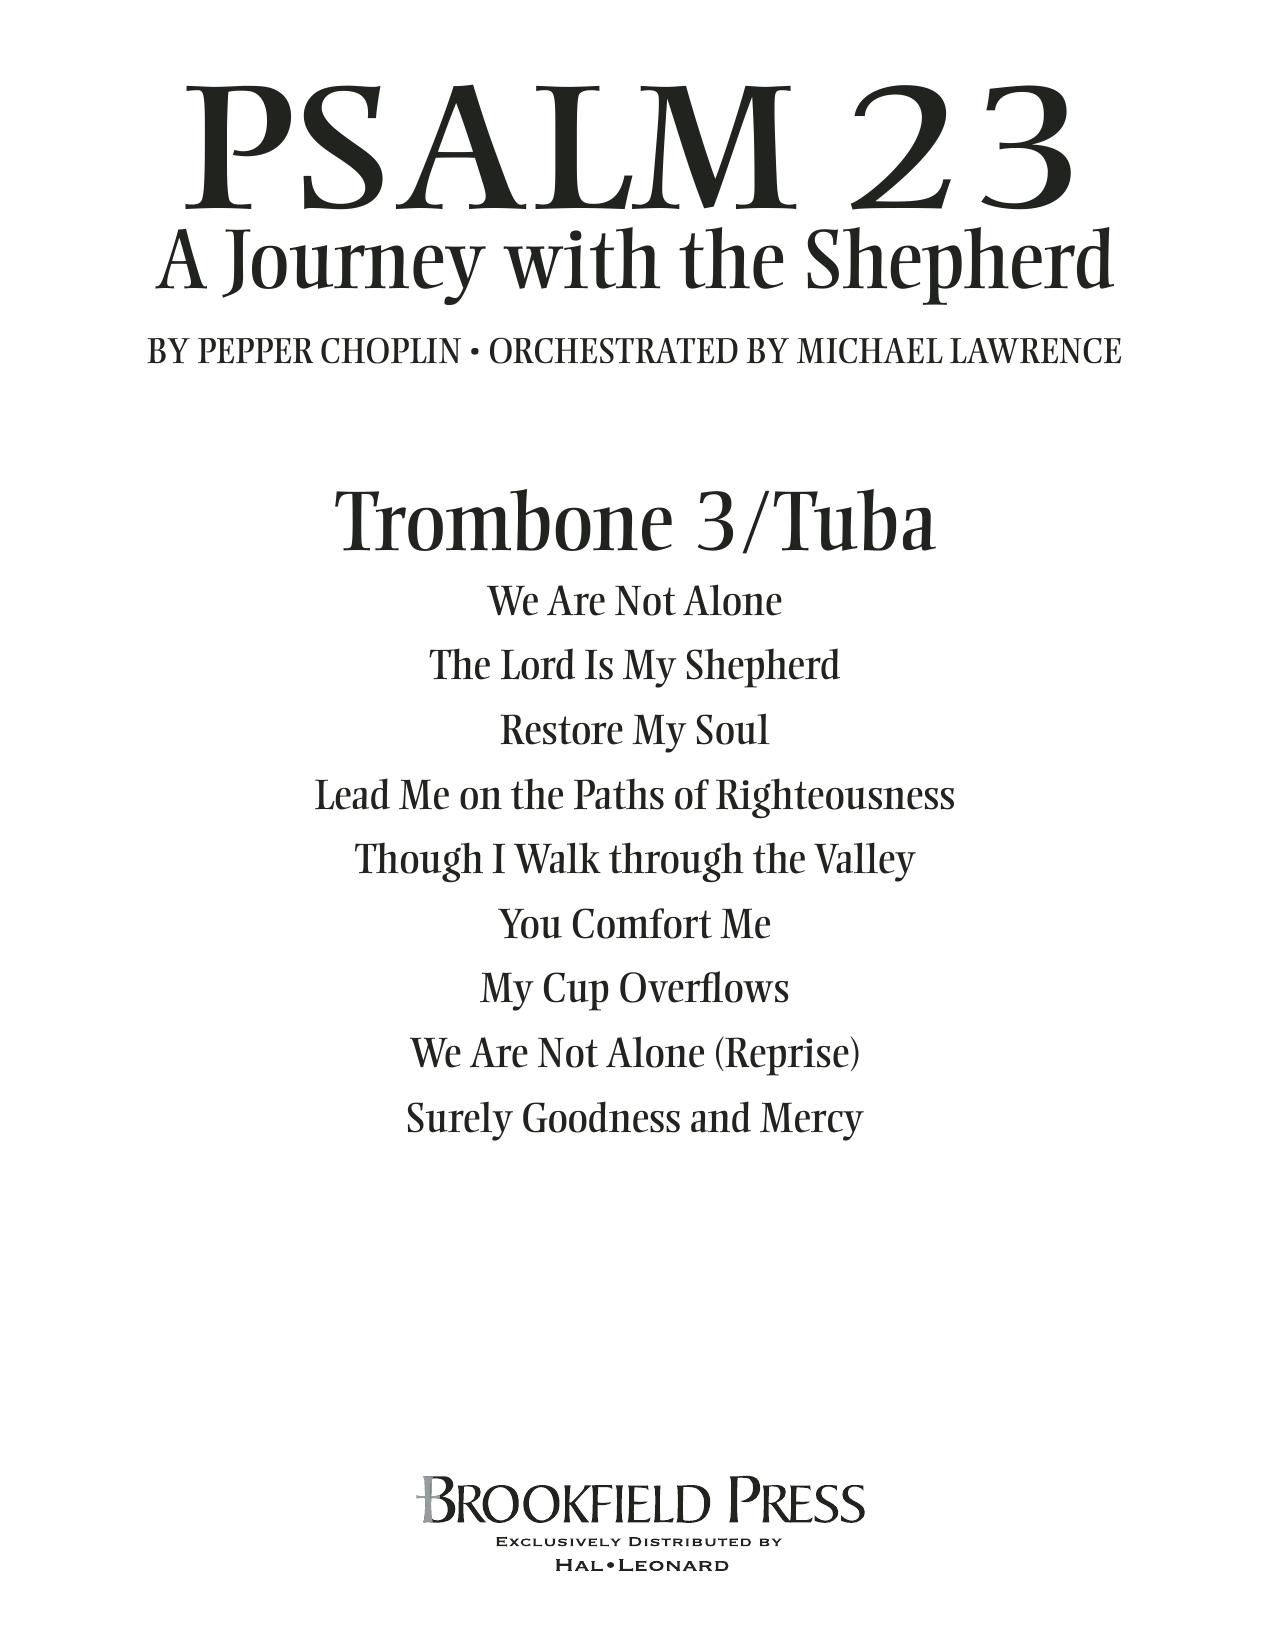 Psalm 23 - A Journey With The Shepherd - Trombone 3/Tuba Sheet Music